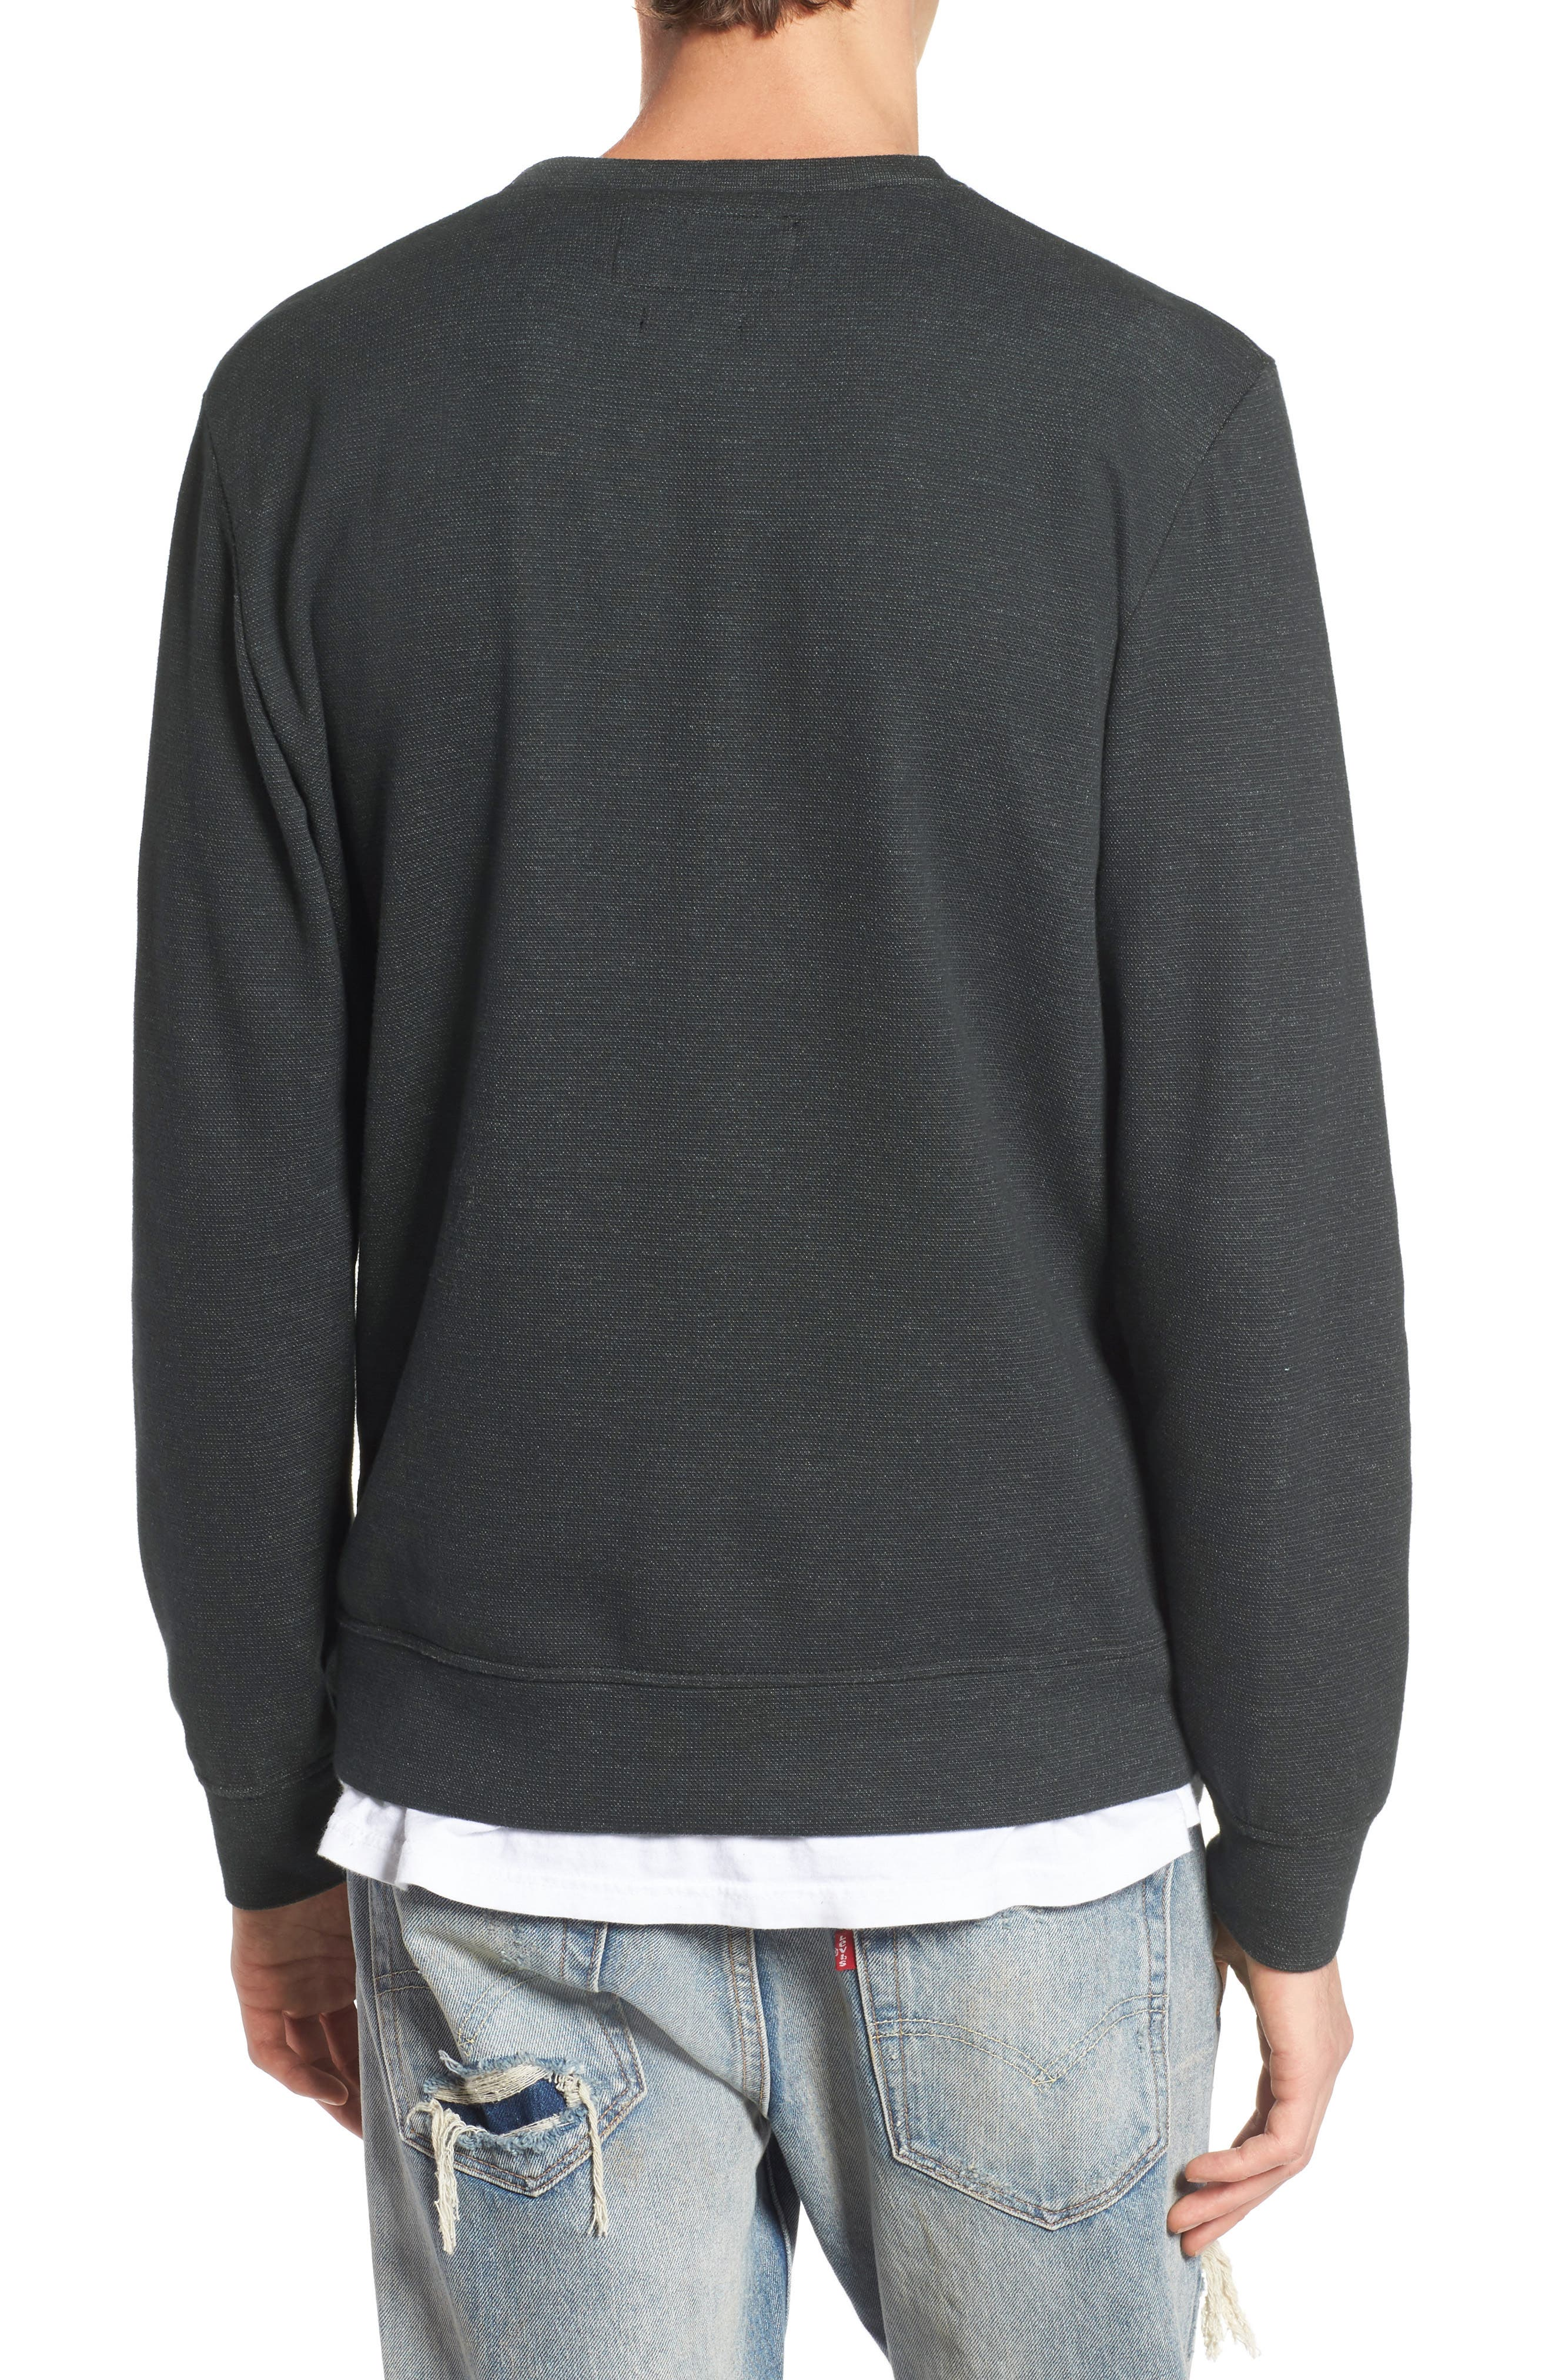 Oracle Sweatshirt,                             Alternate thumbnail 2, color,                             Green